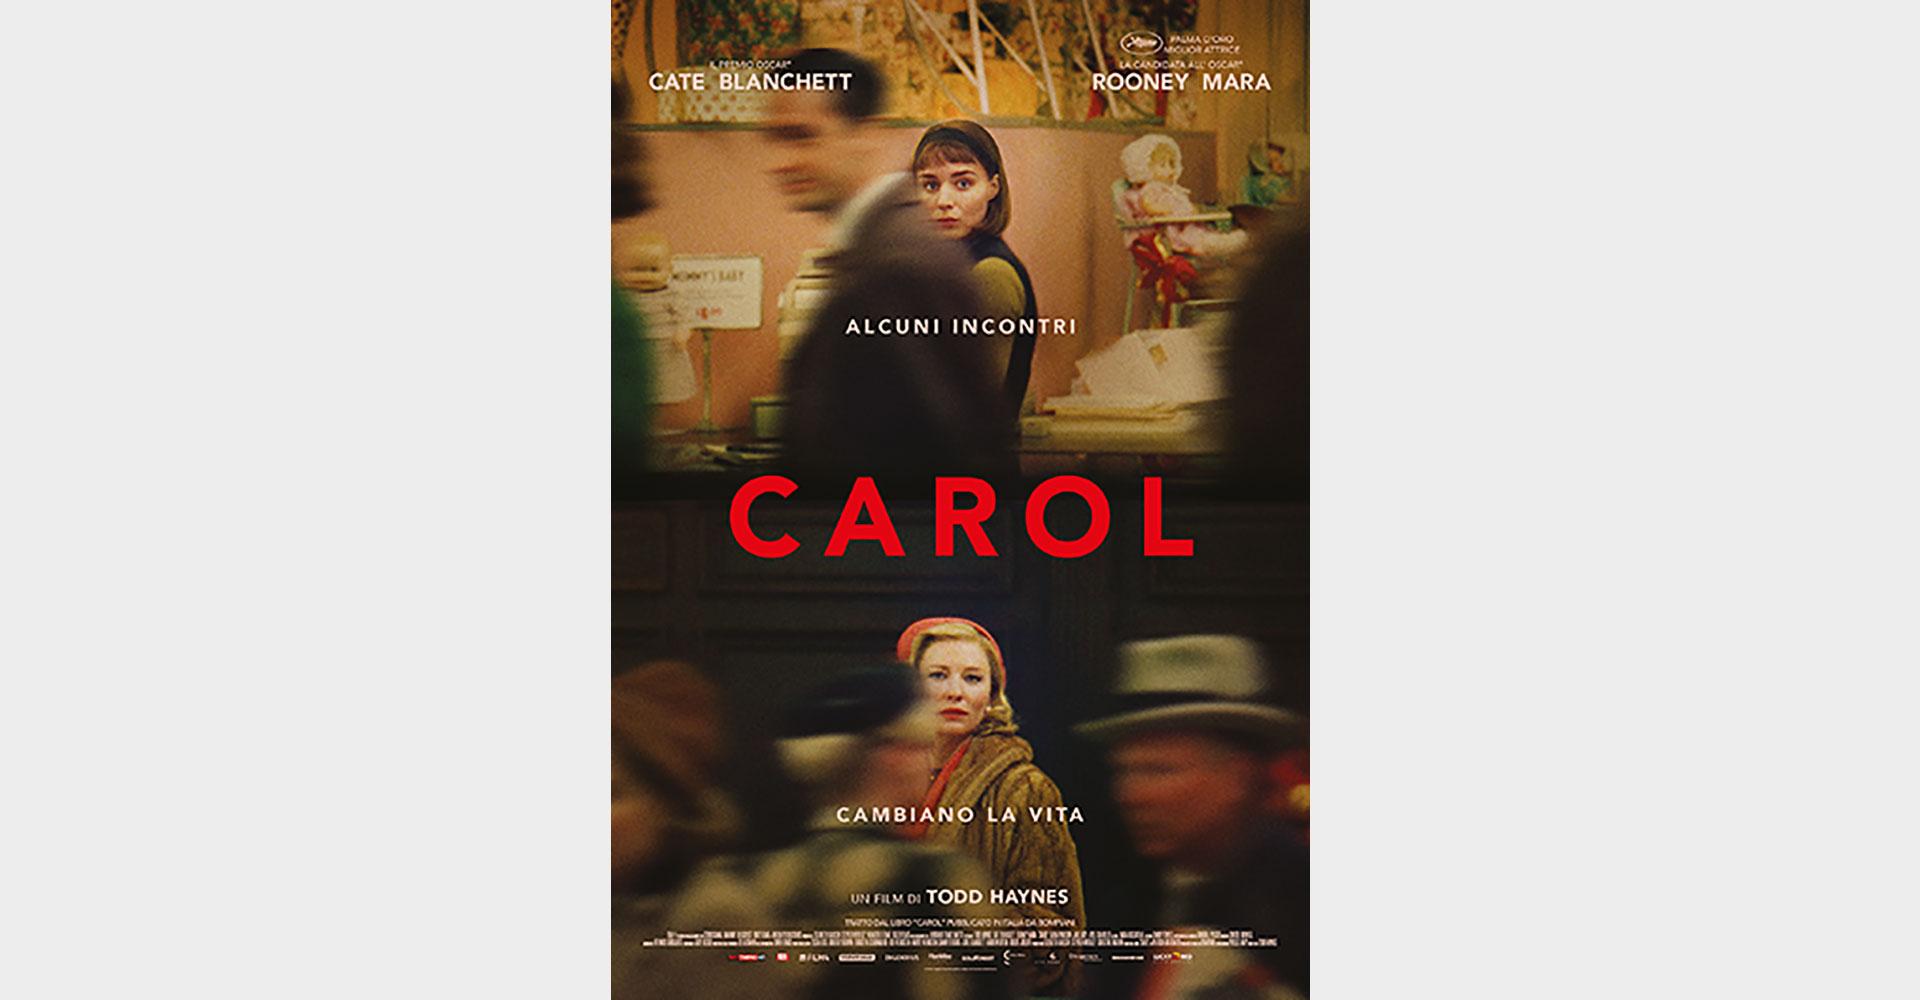 CarolVerticale